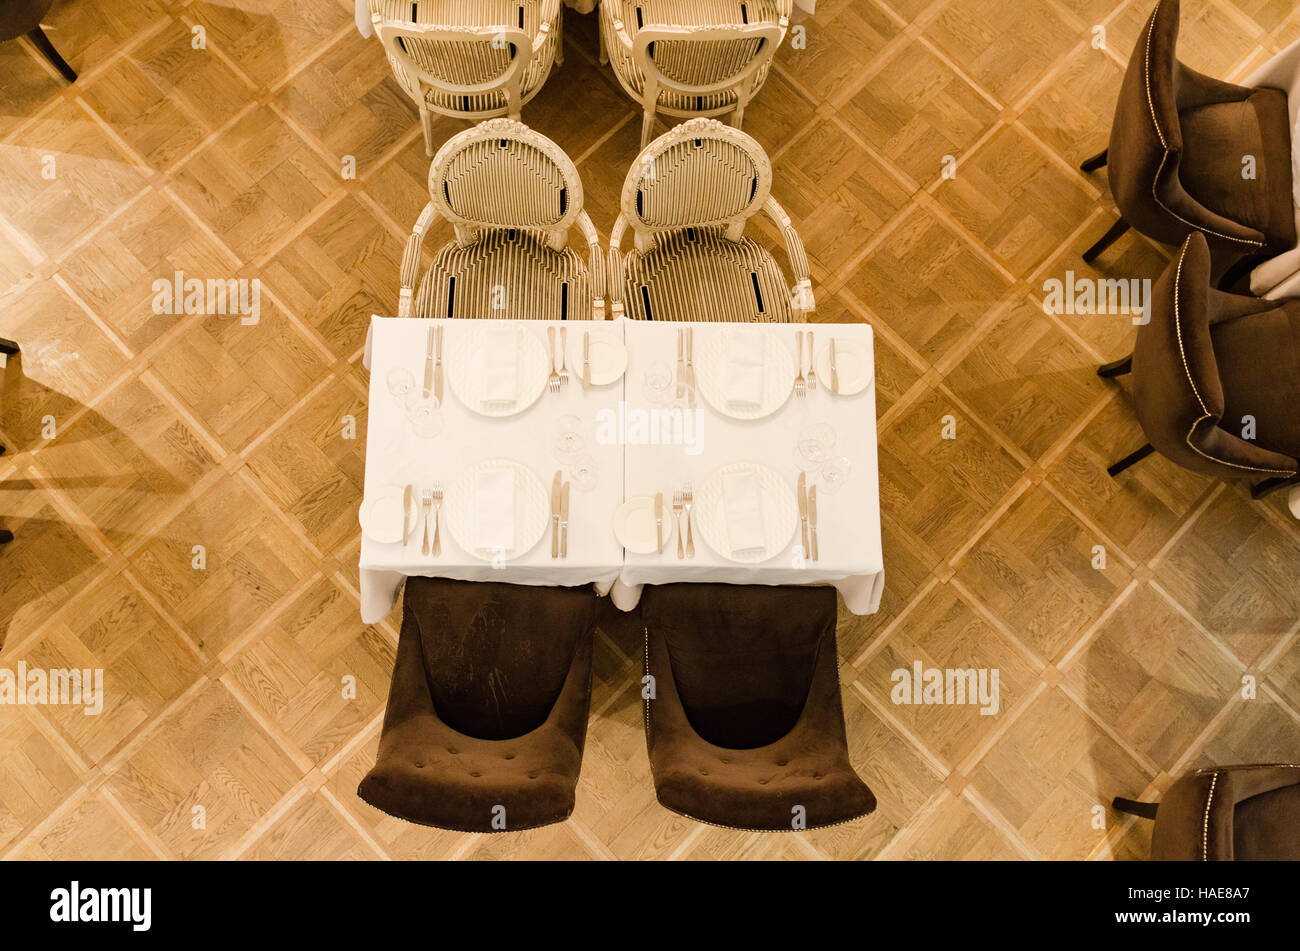 restaurant interior shot stock photo, royalty free image